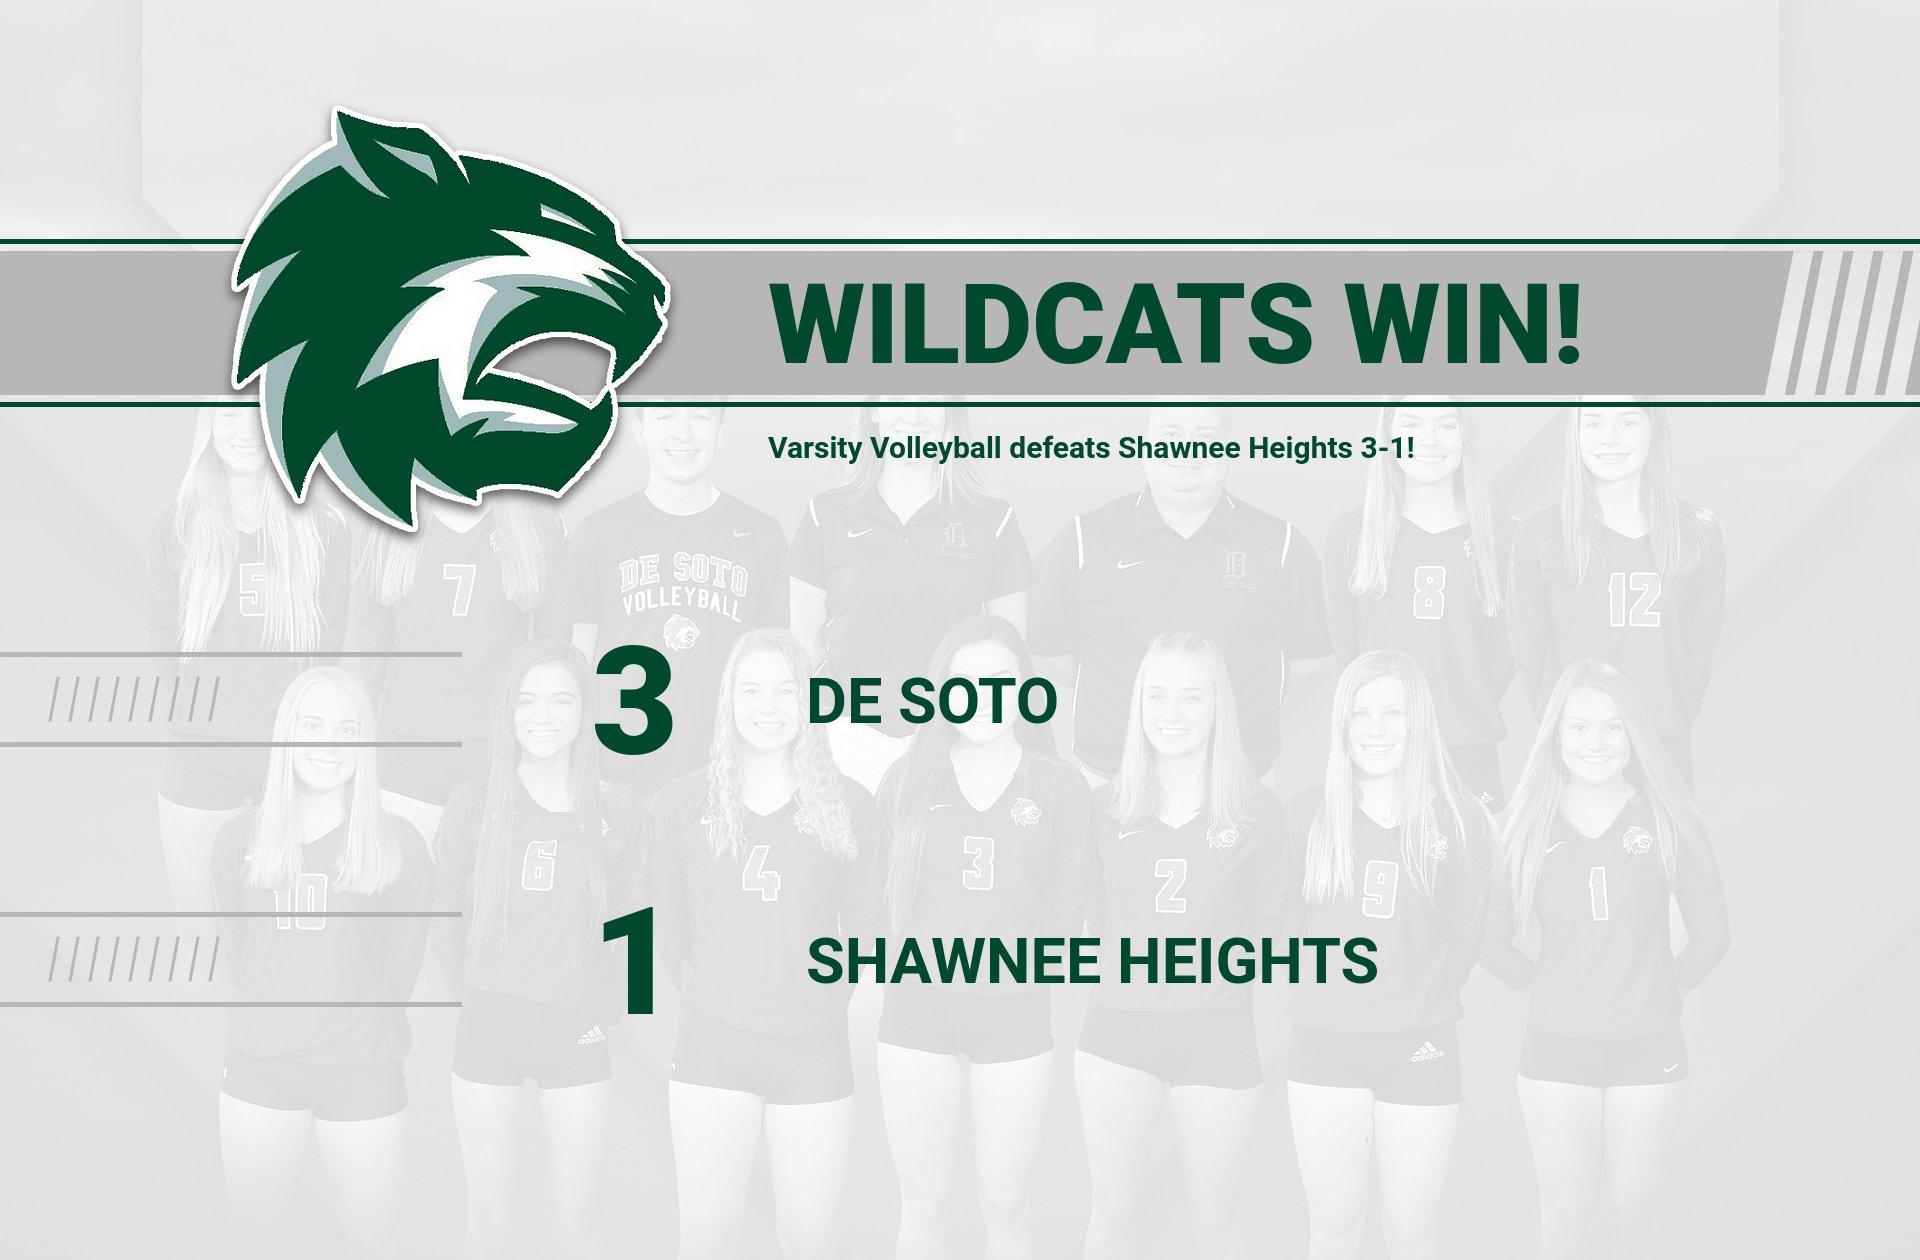 Varsity Volleyball defeats Shawnee Heights 3-1